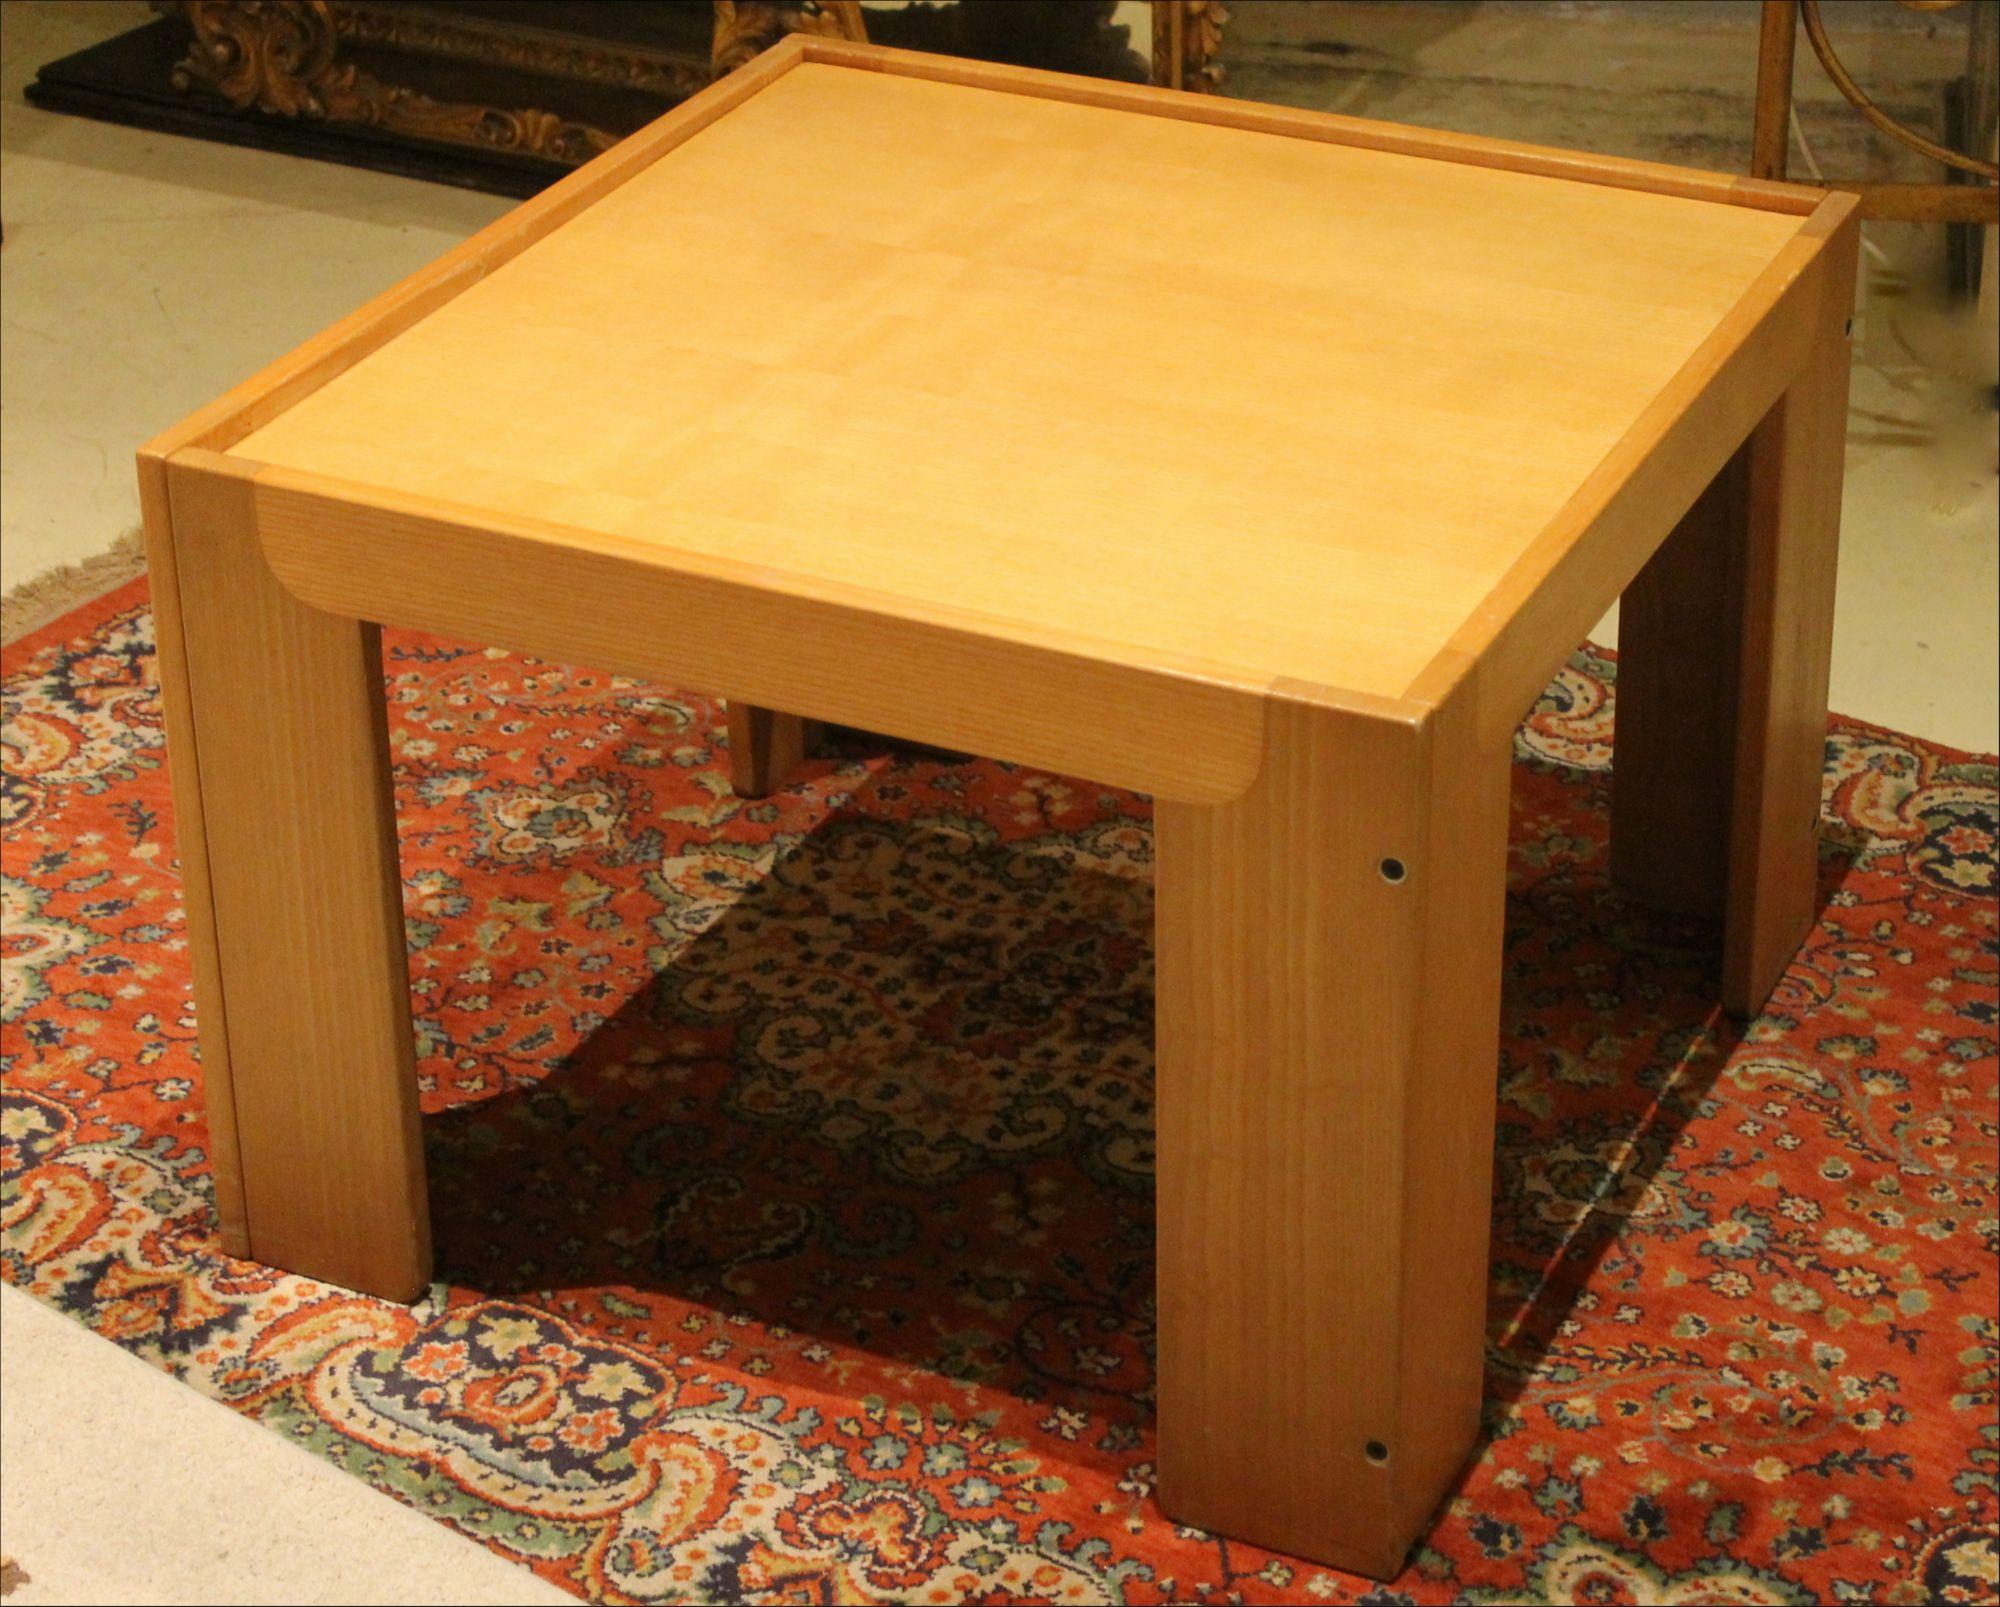 Cassina Mid Century Modern Italian Design Square Light Wood Coffee Table